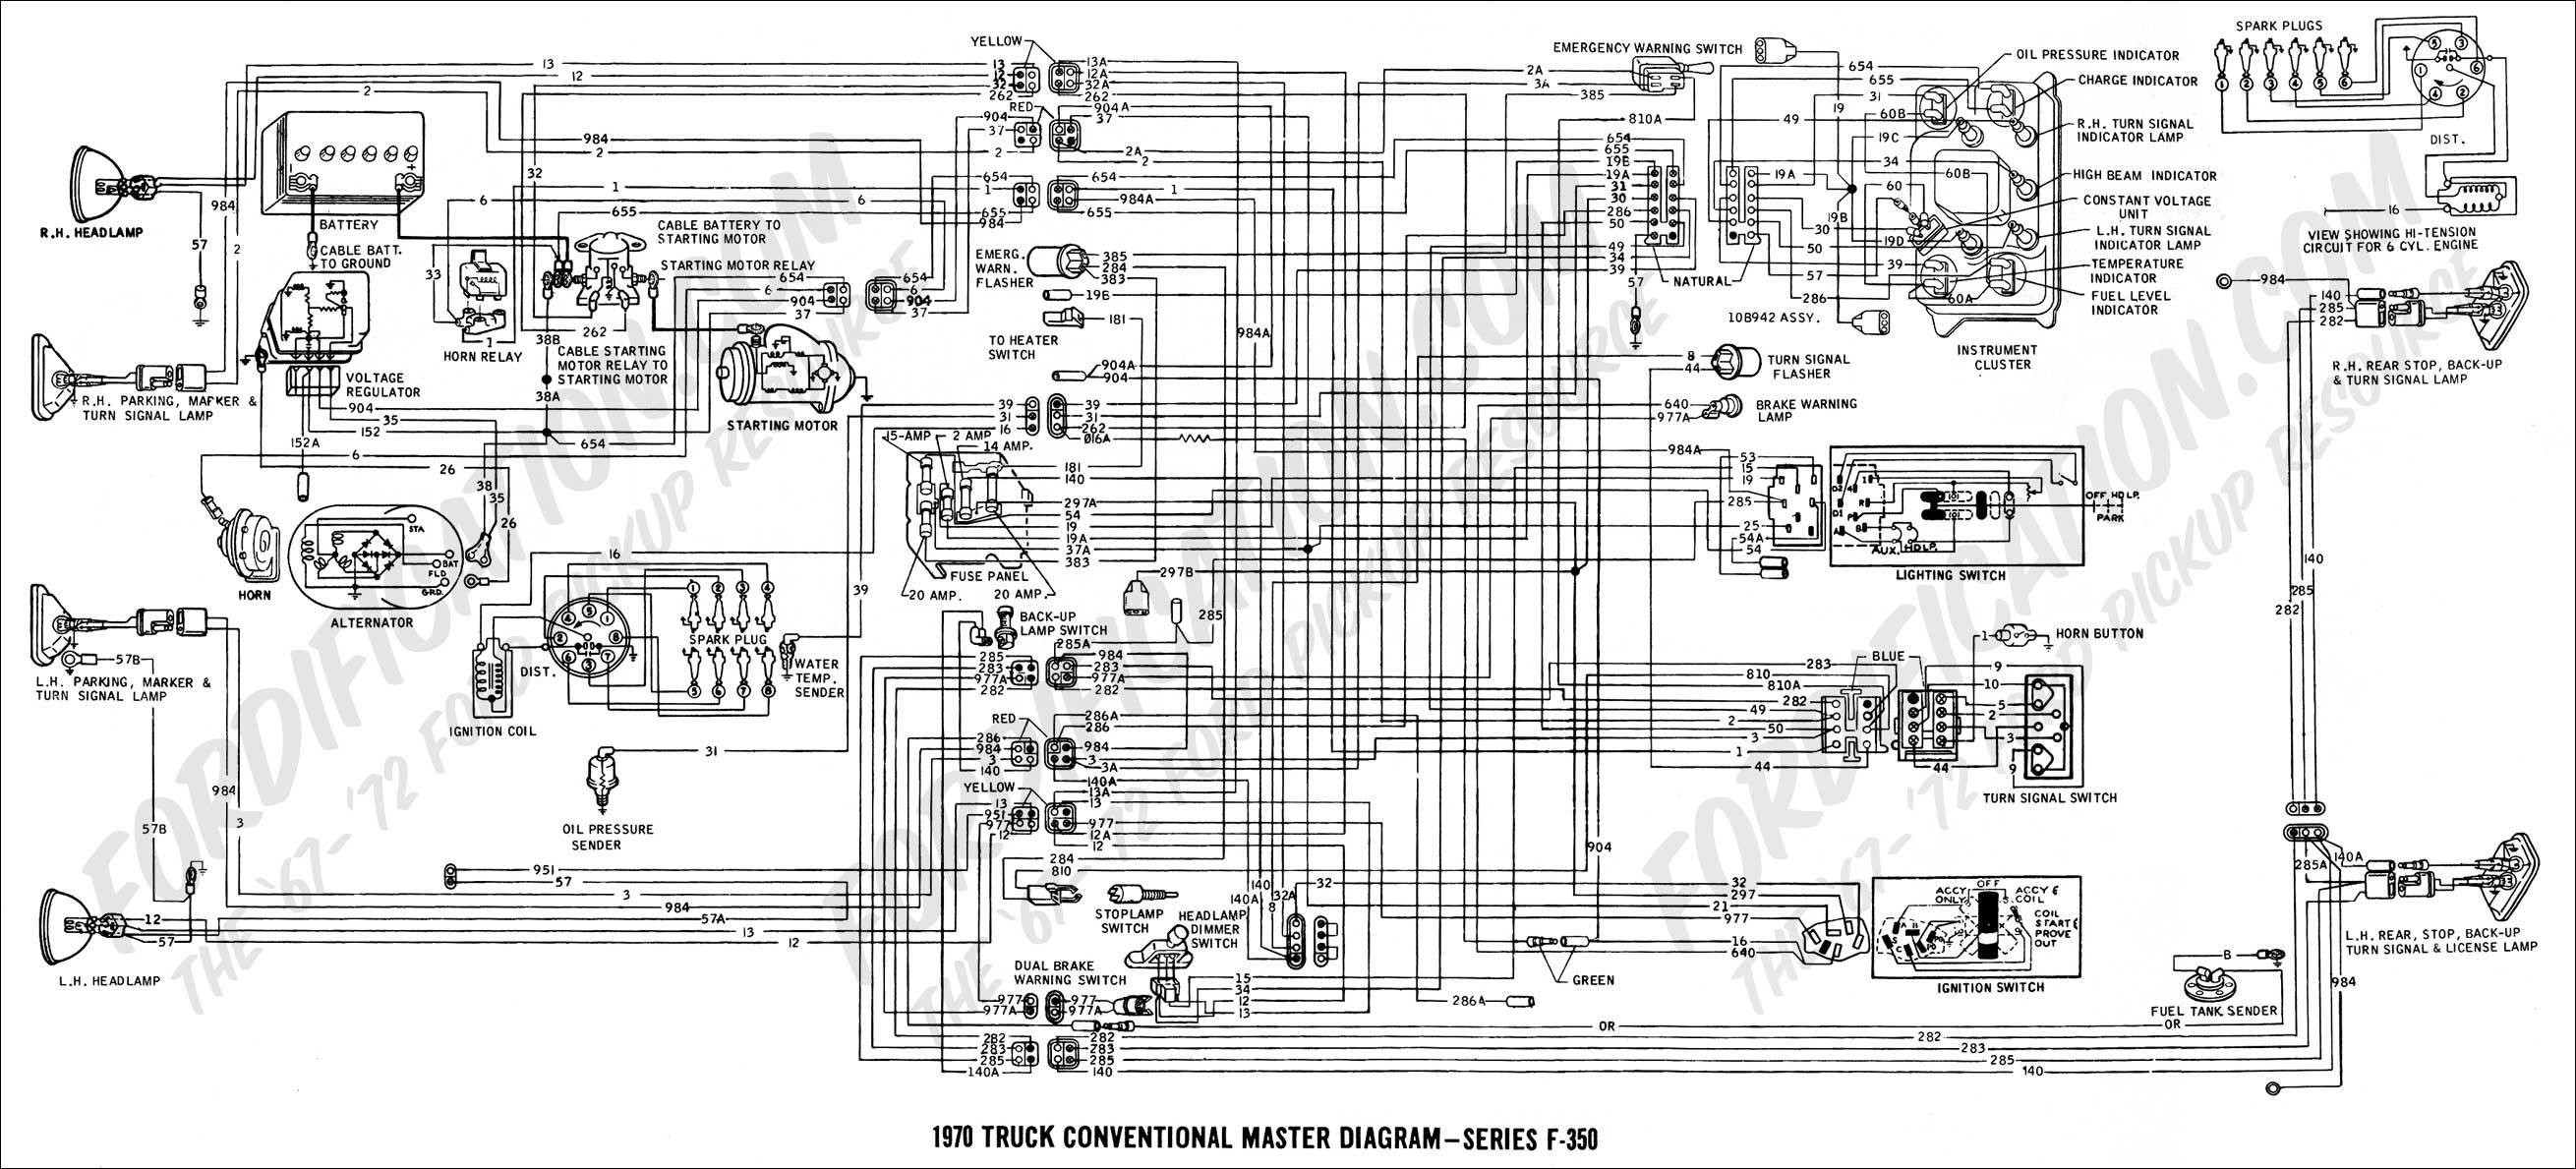 Diagram Of Car Under Hood Bucket 2002 F350 Superduty Electrical Wiring Diagrams Wiring Info • Of Diagram Of Car Under Hood